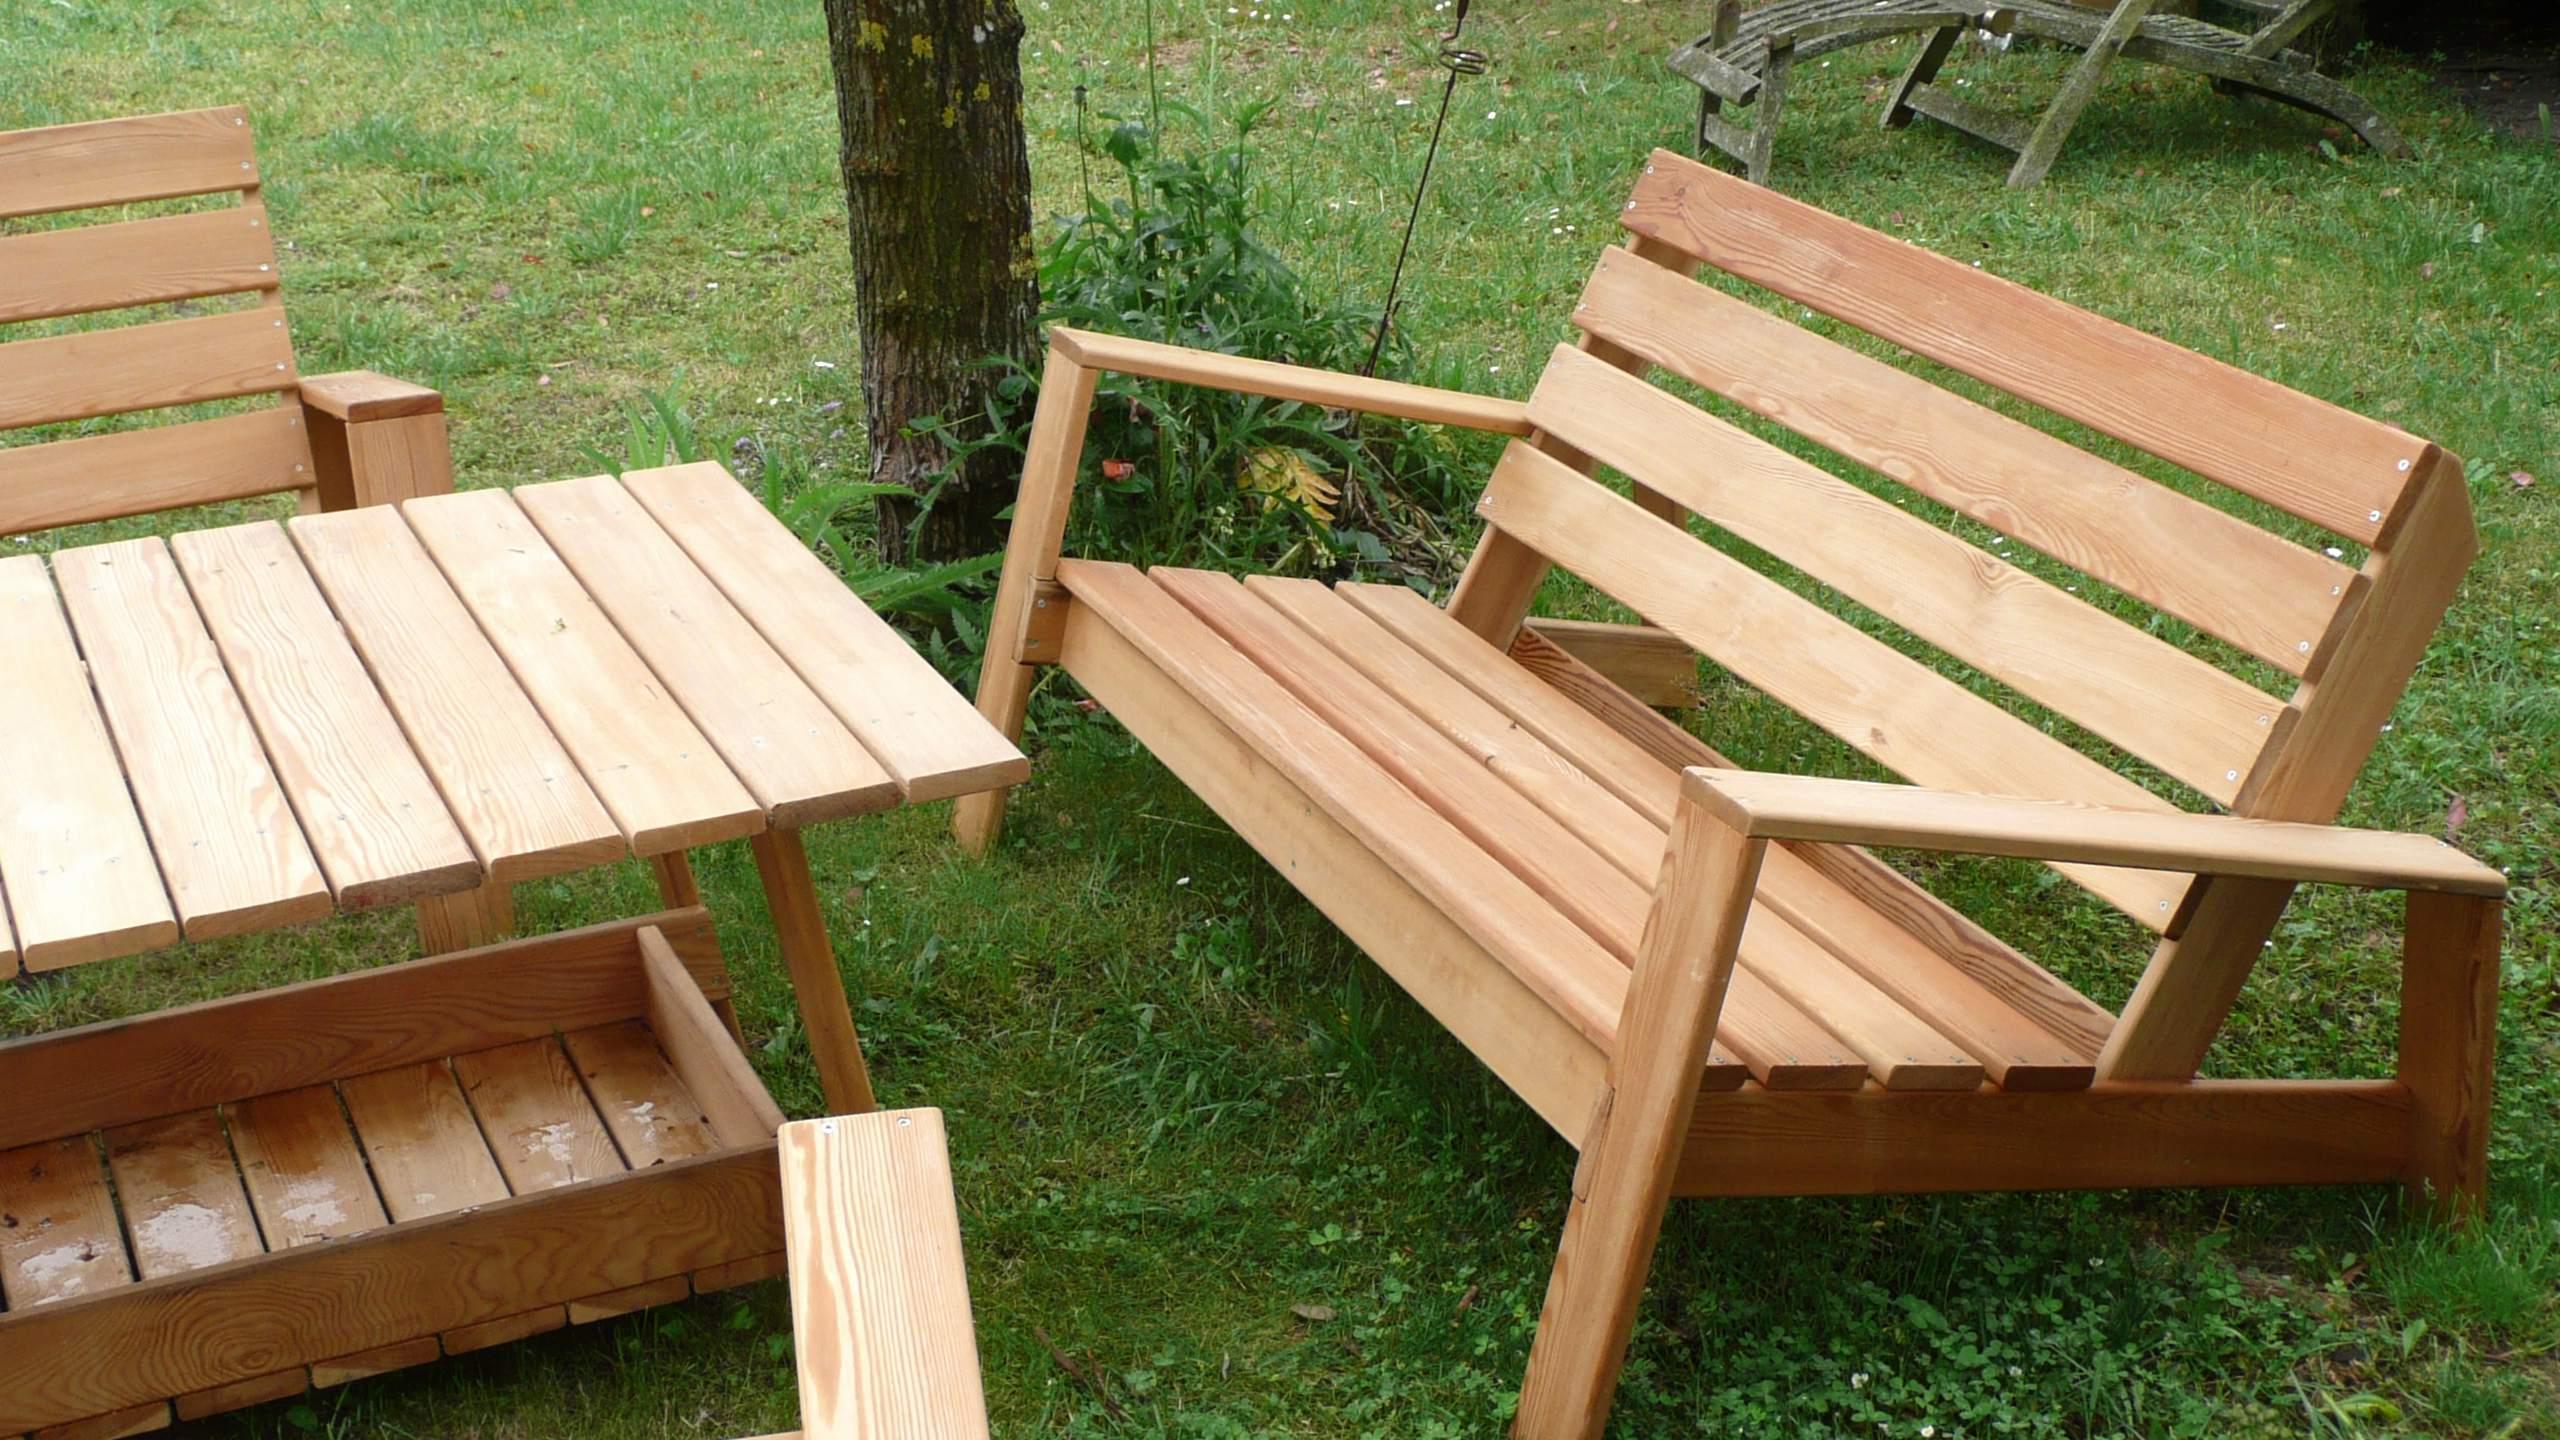 Housse De Protection Salon De Jardin Leroy Merlin Luxe Galerie Housse Table De Jardin Gracieux 41 Beau Housse De Canapé Standard